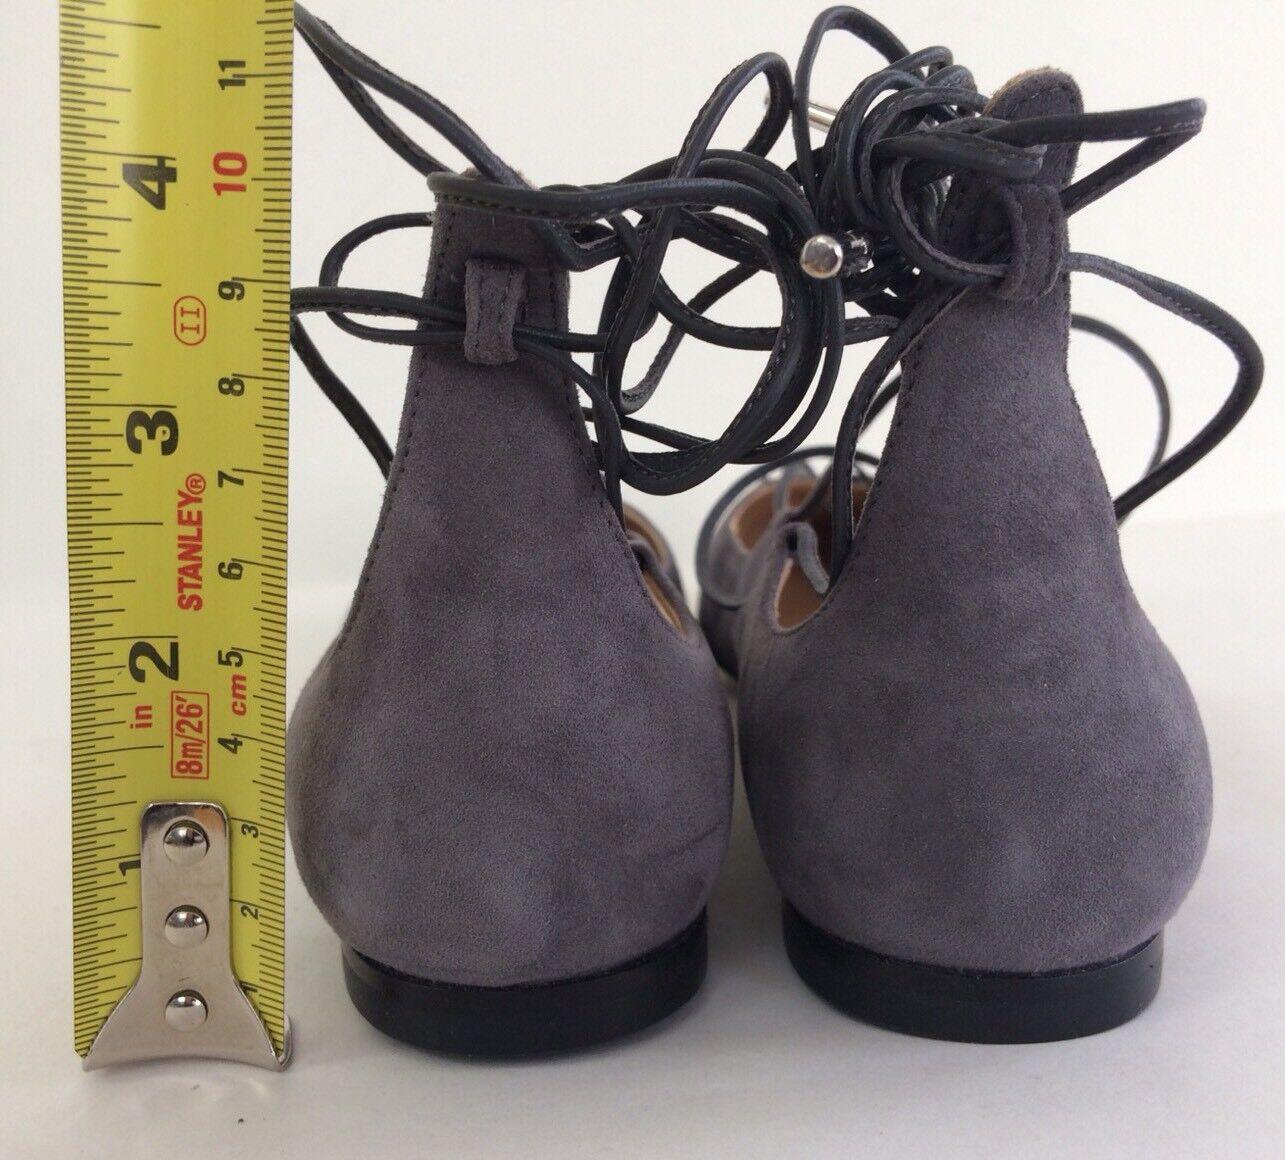 New SALVATORE SALVATORE SALVATORE FERRAGAMO Claire Lace Up Suede Ballet Flats Grey Size 5.5M b8aa47